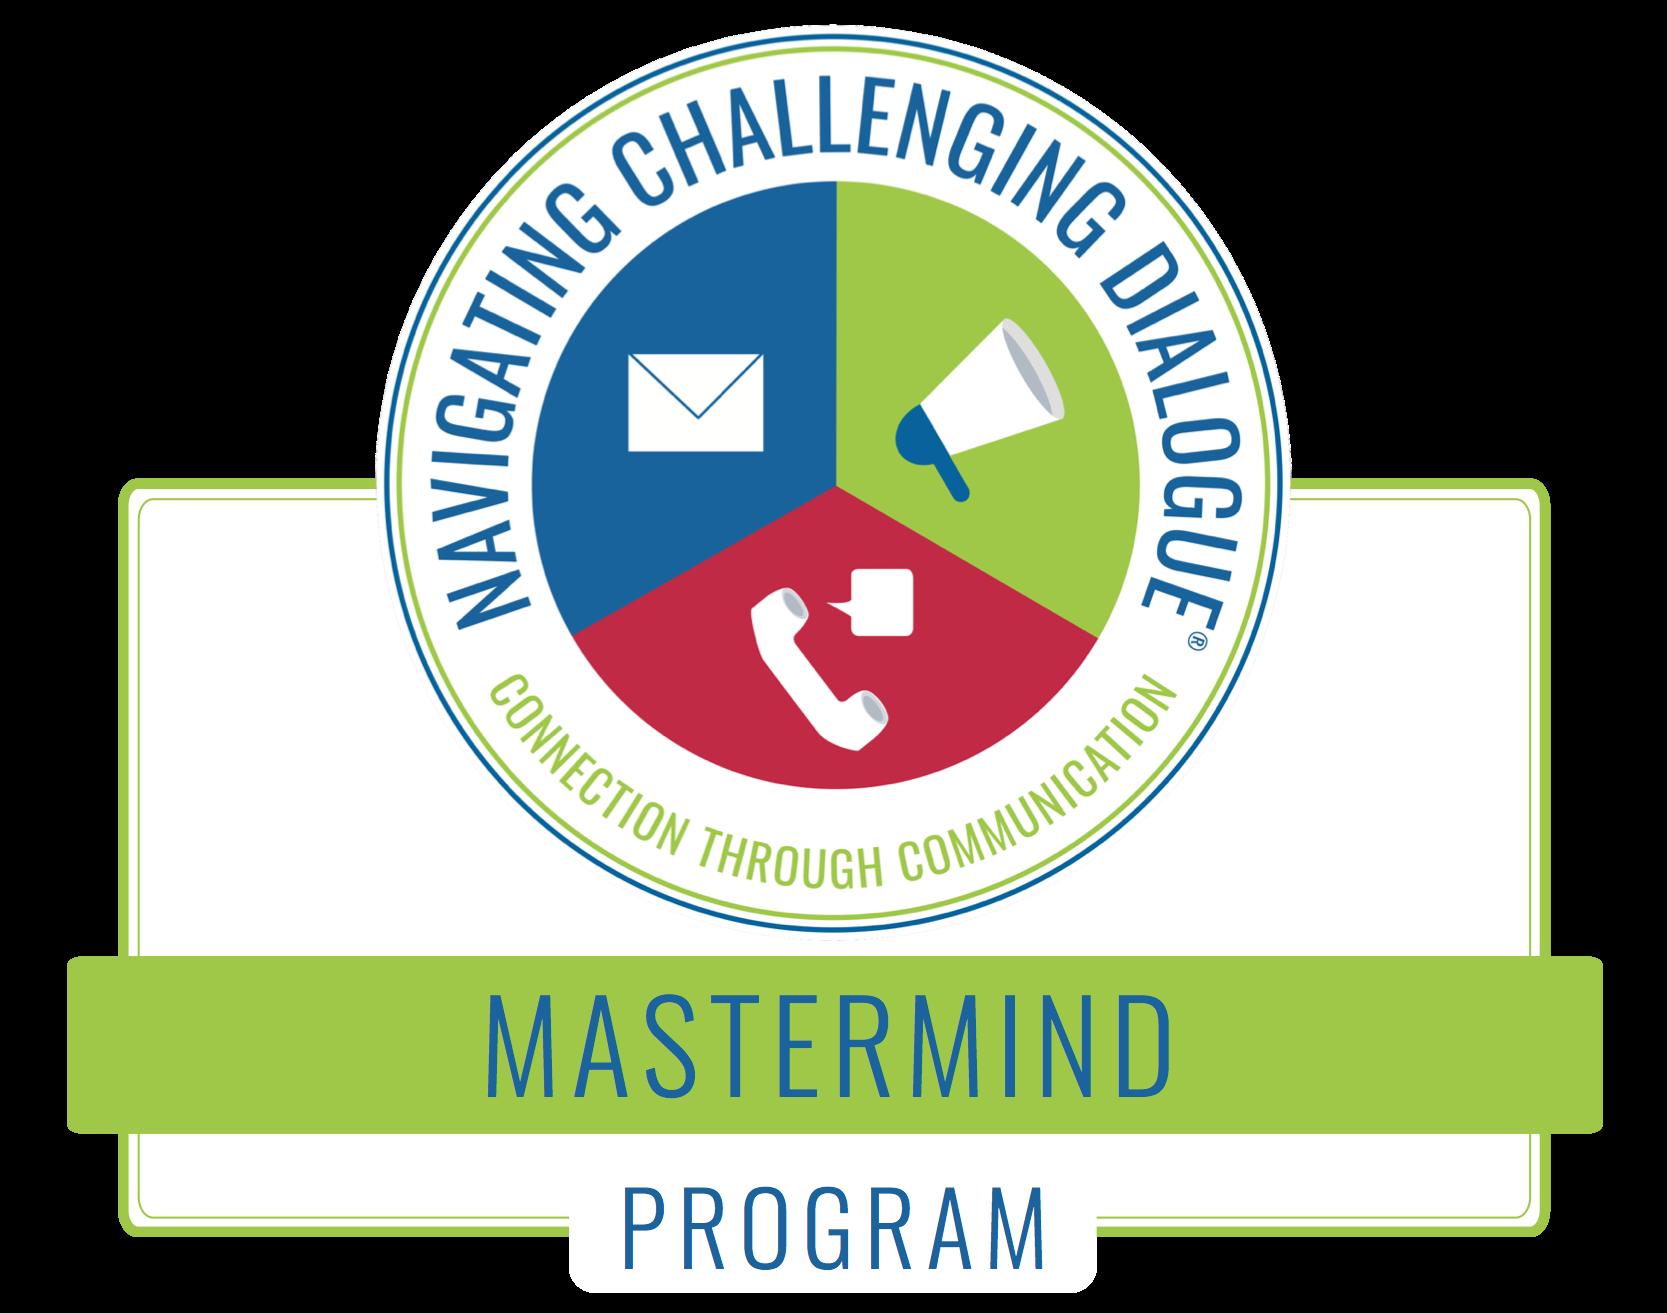 Restricted to Registrants of the Mastermind Program